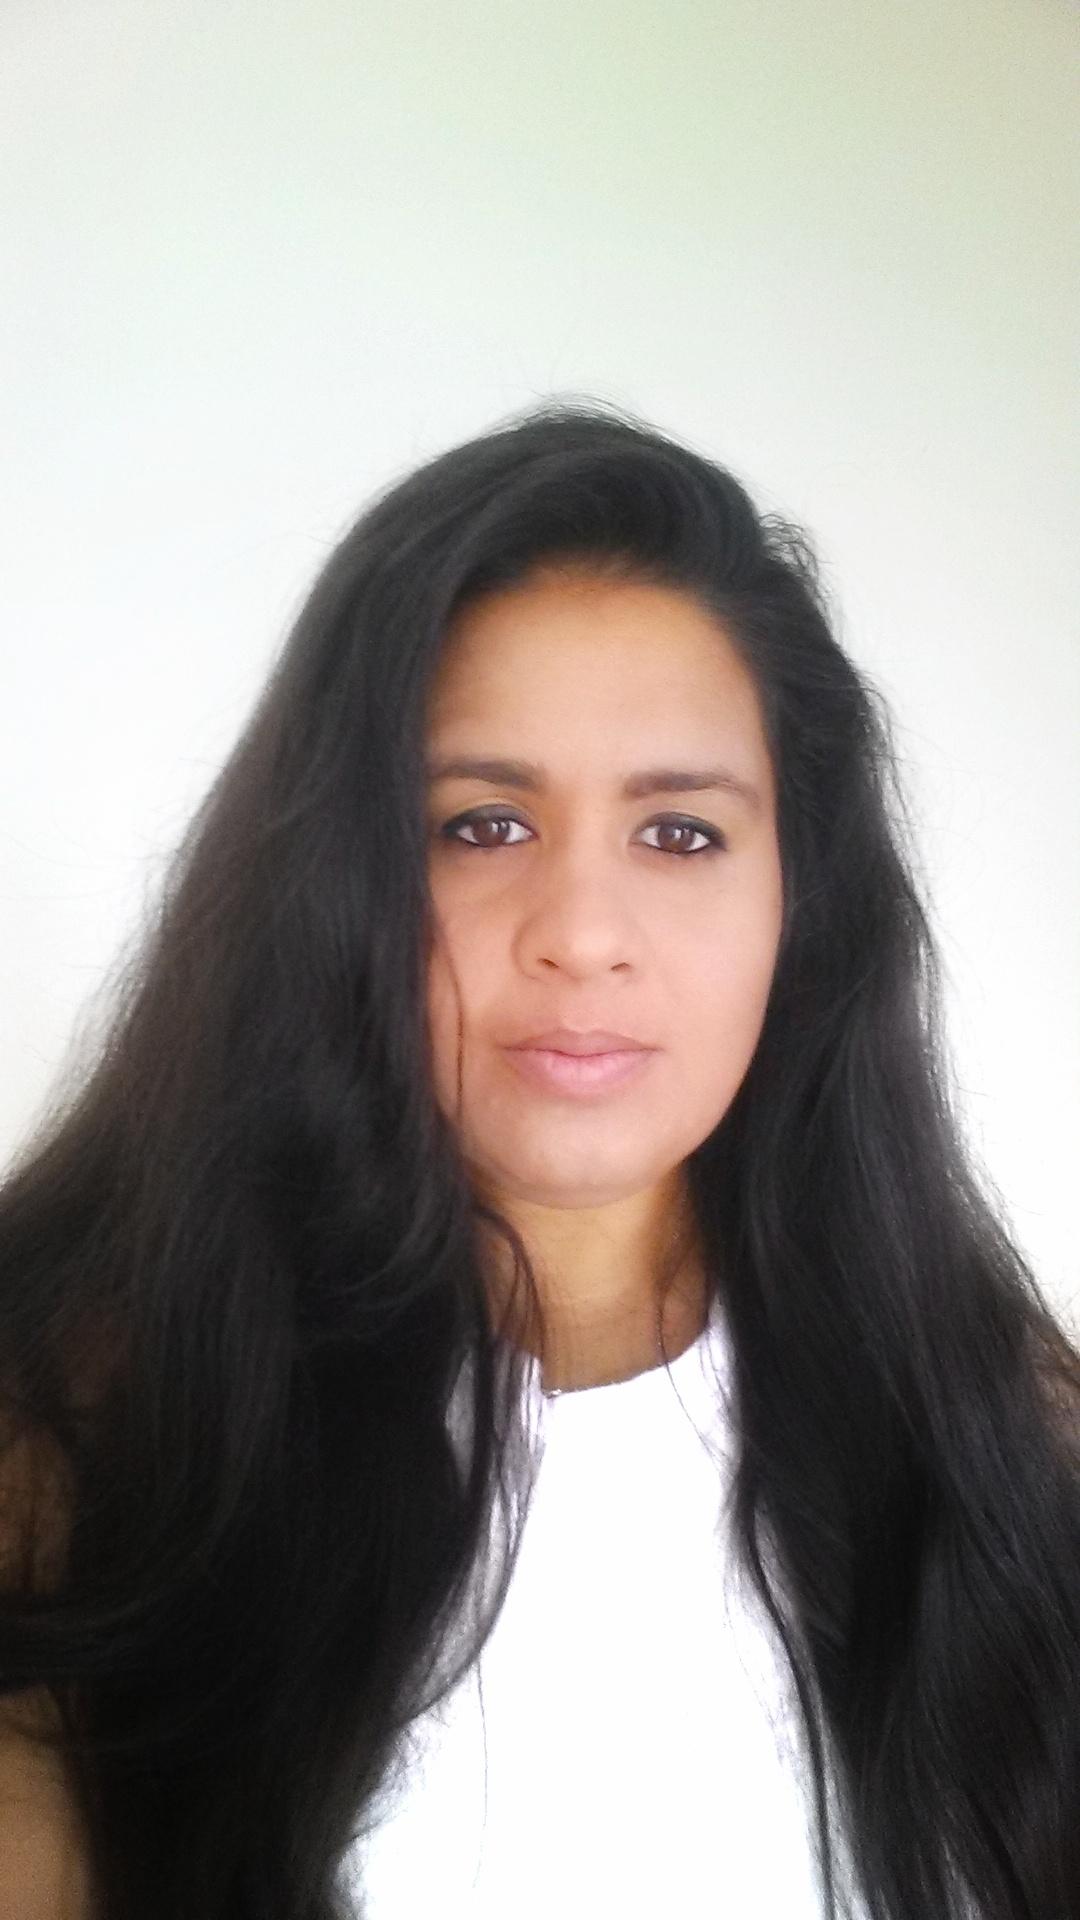 Muslim in Moderation (podcast): Muslim Women and Sport